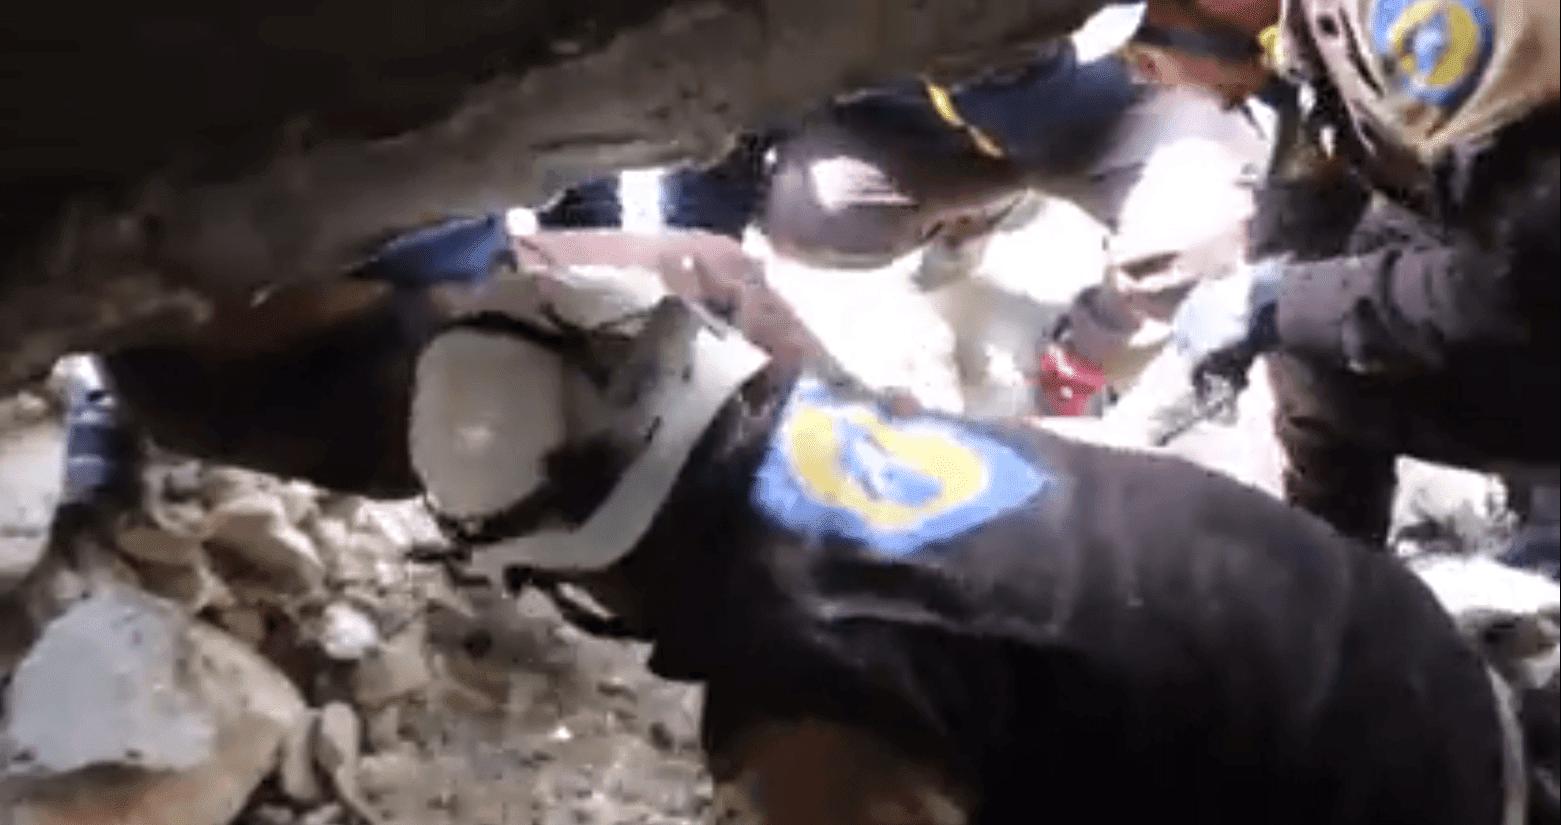 White Helmets filmados apresurándose para remover escombros para rescatar a dos cachorros. Fuente: YouTube / Daily Mail